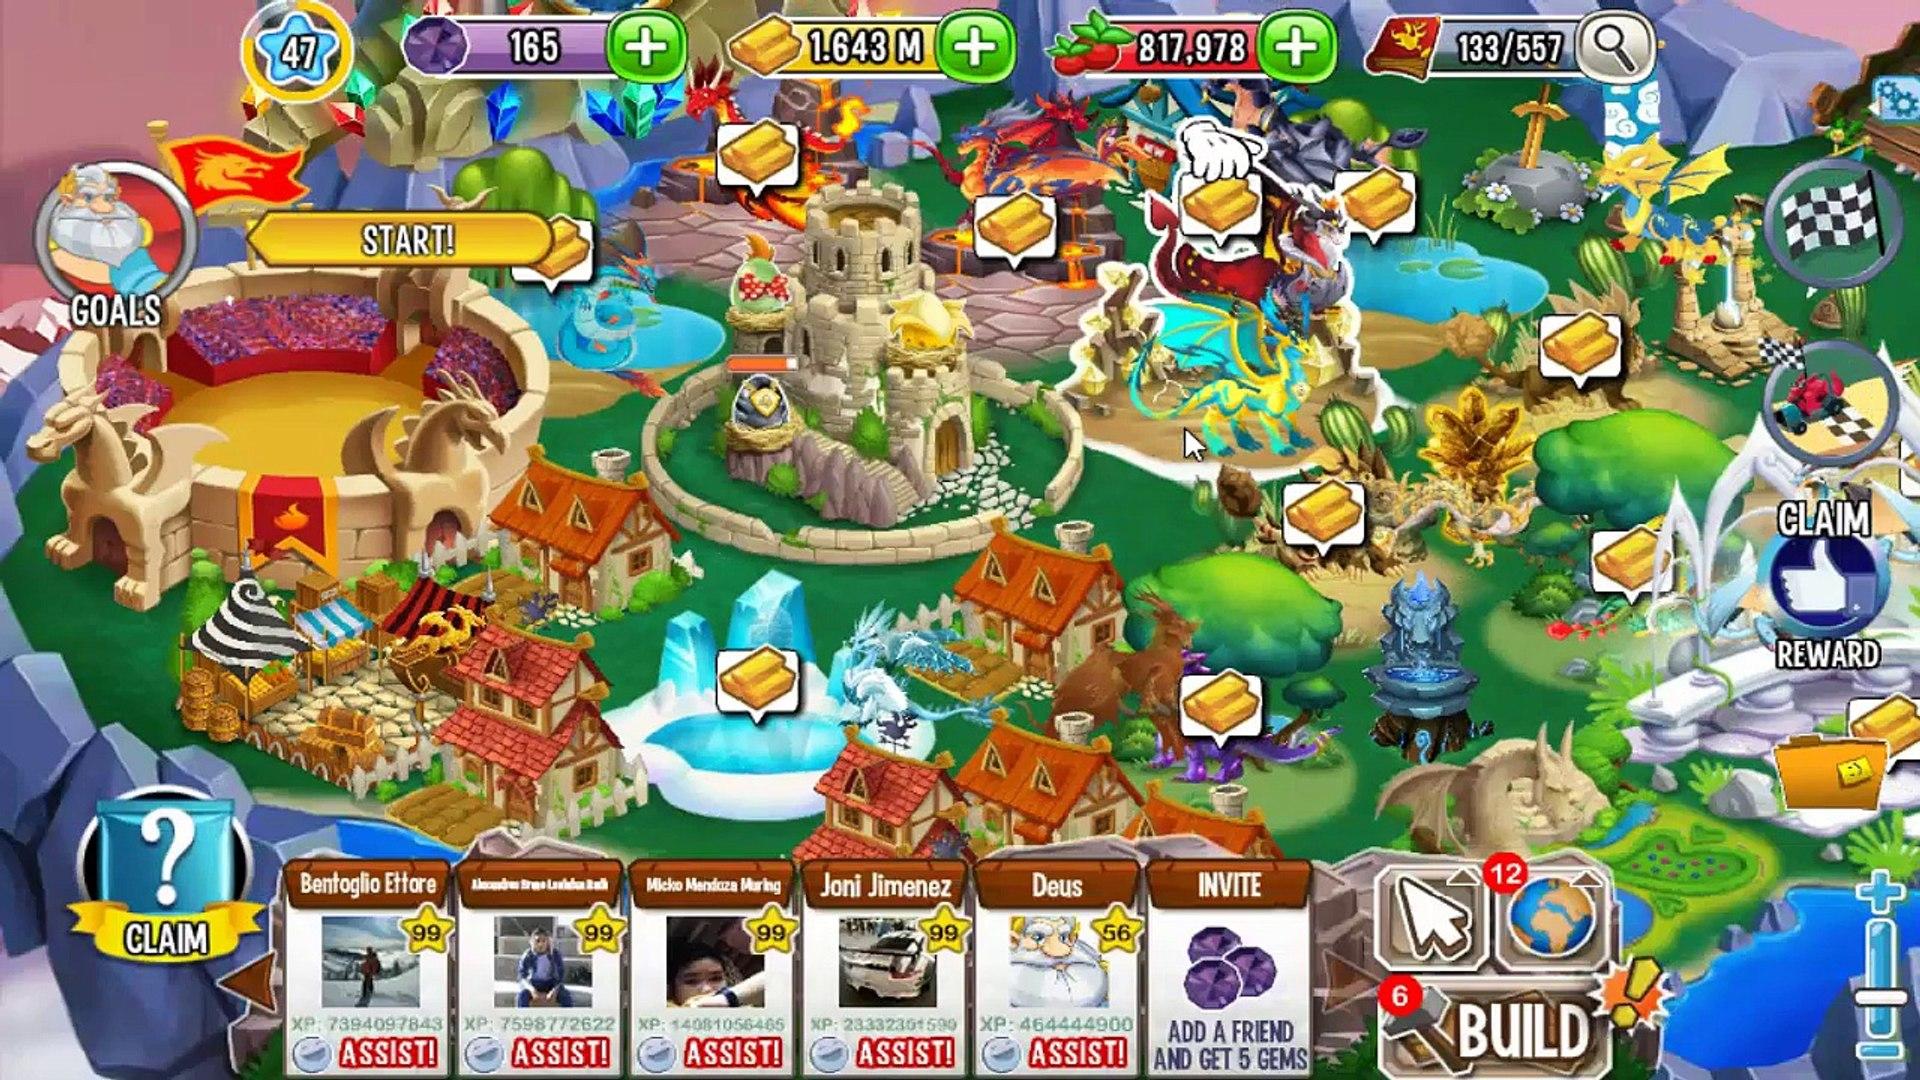 Dragon City New Heroic Race Time To Get High Tidal Dragon: Episode 06 Lap 7 | High Tidal D